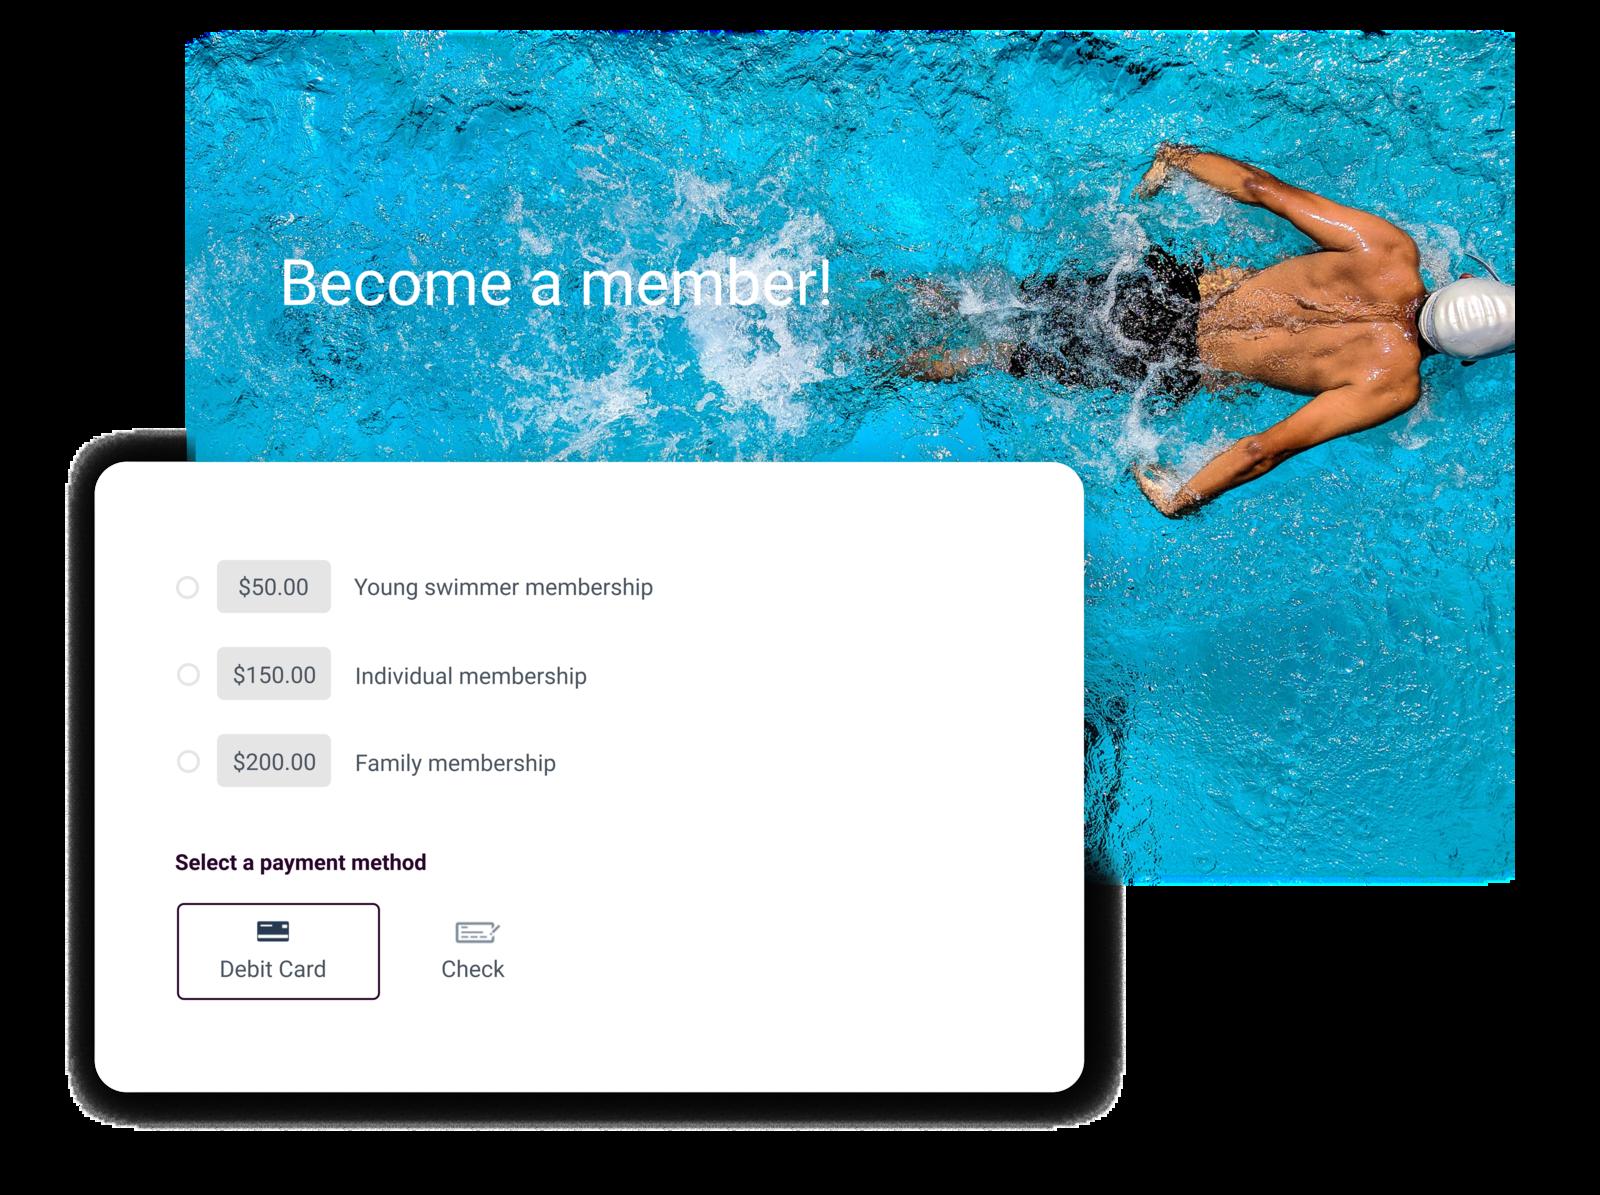 swim club management software summary